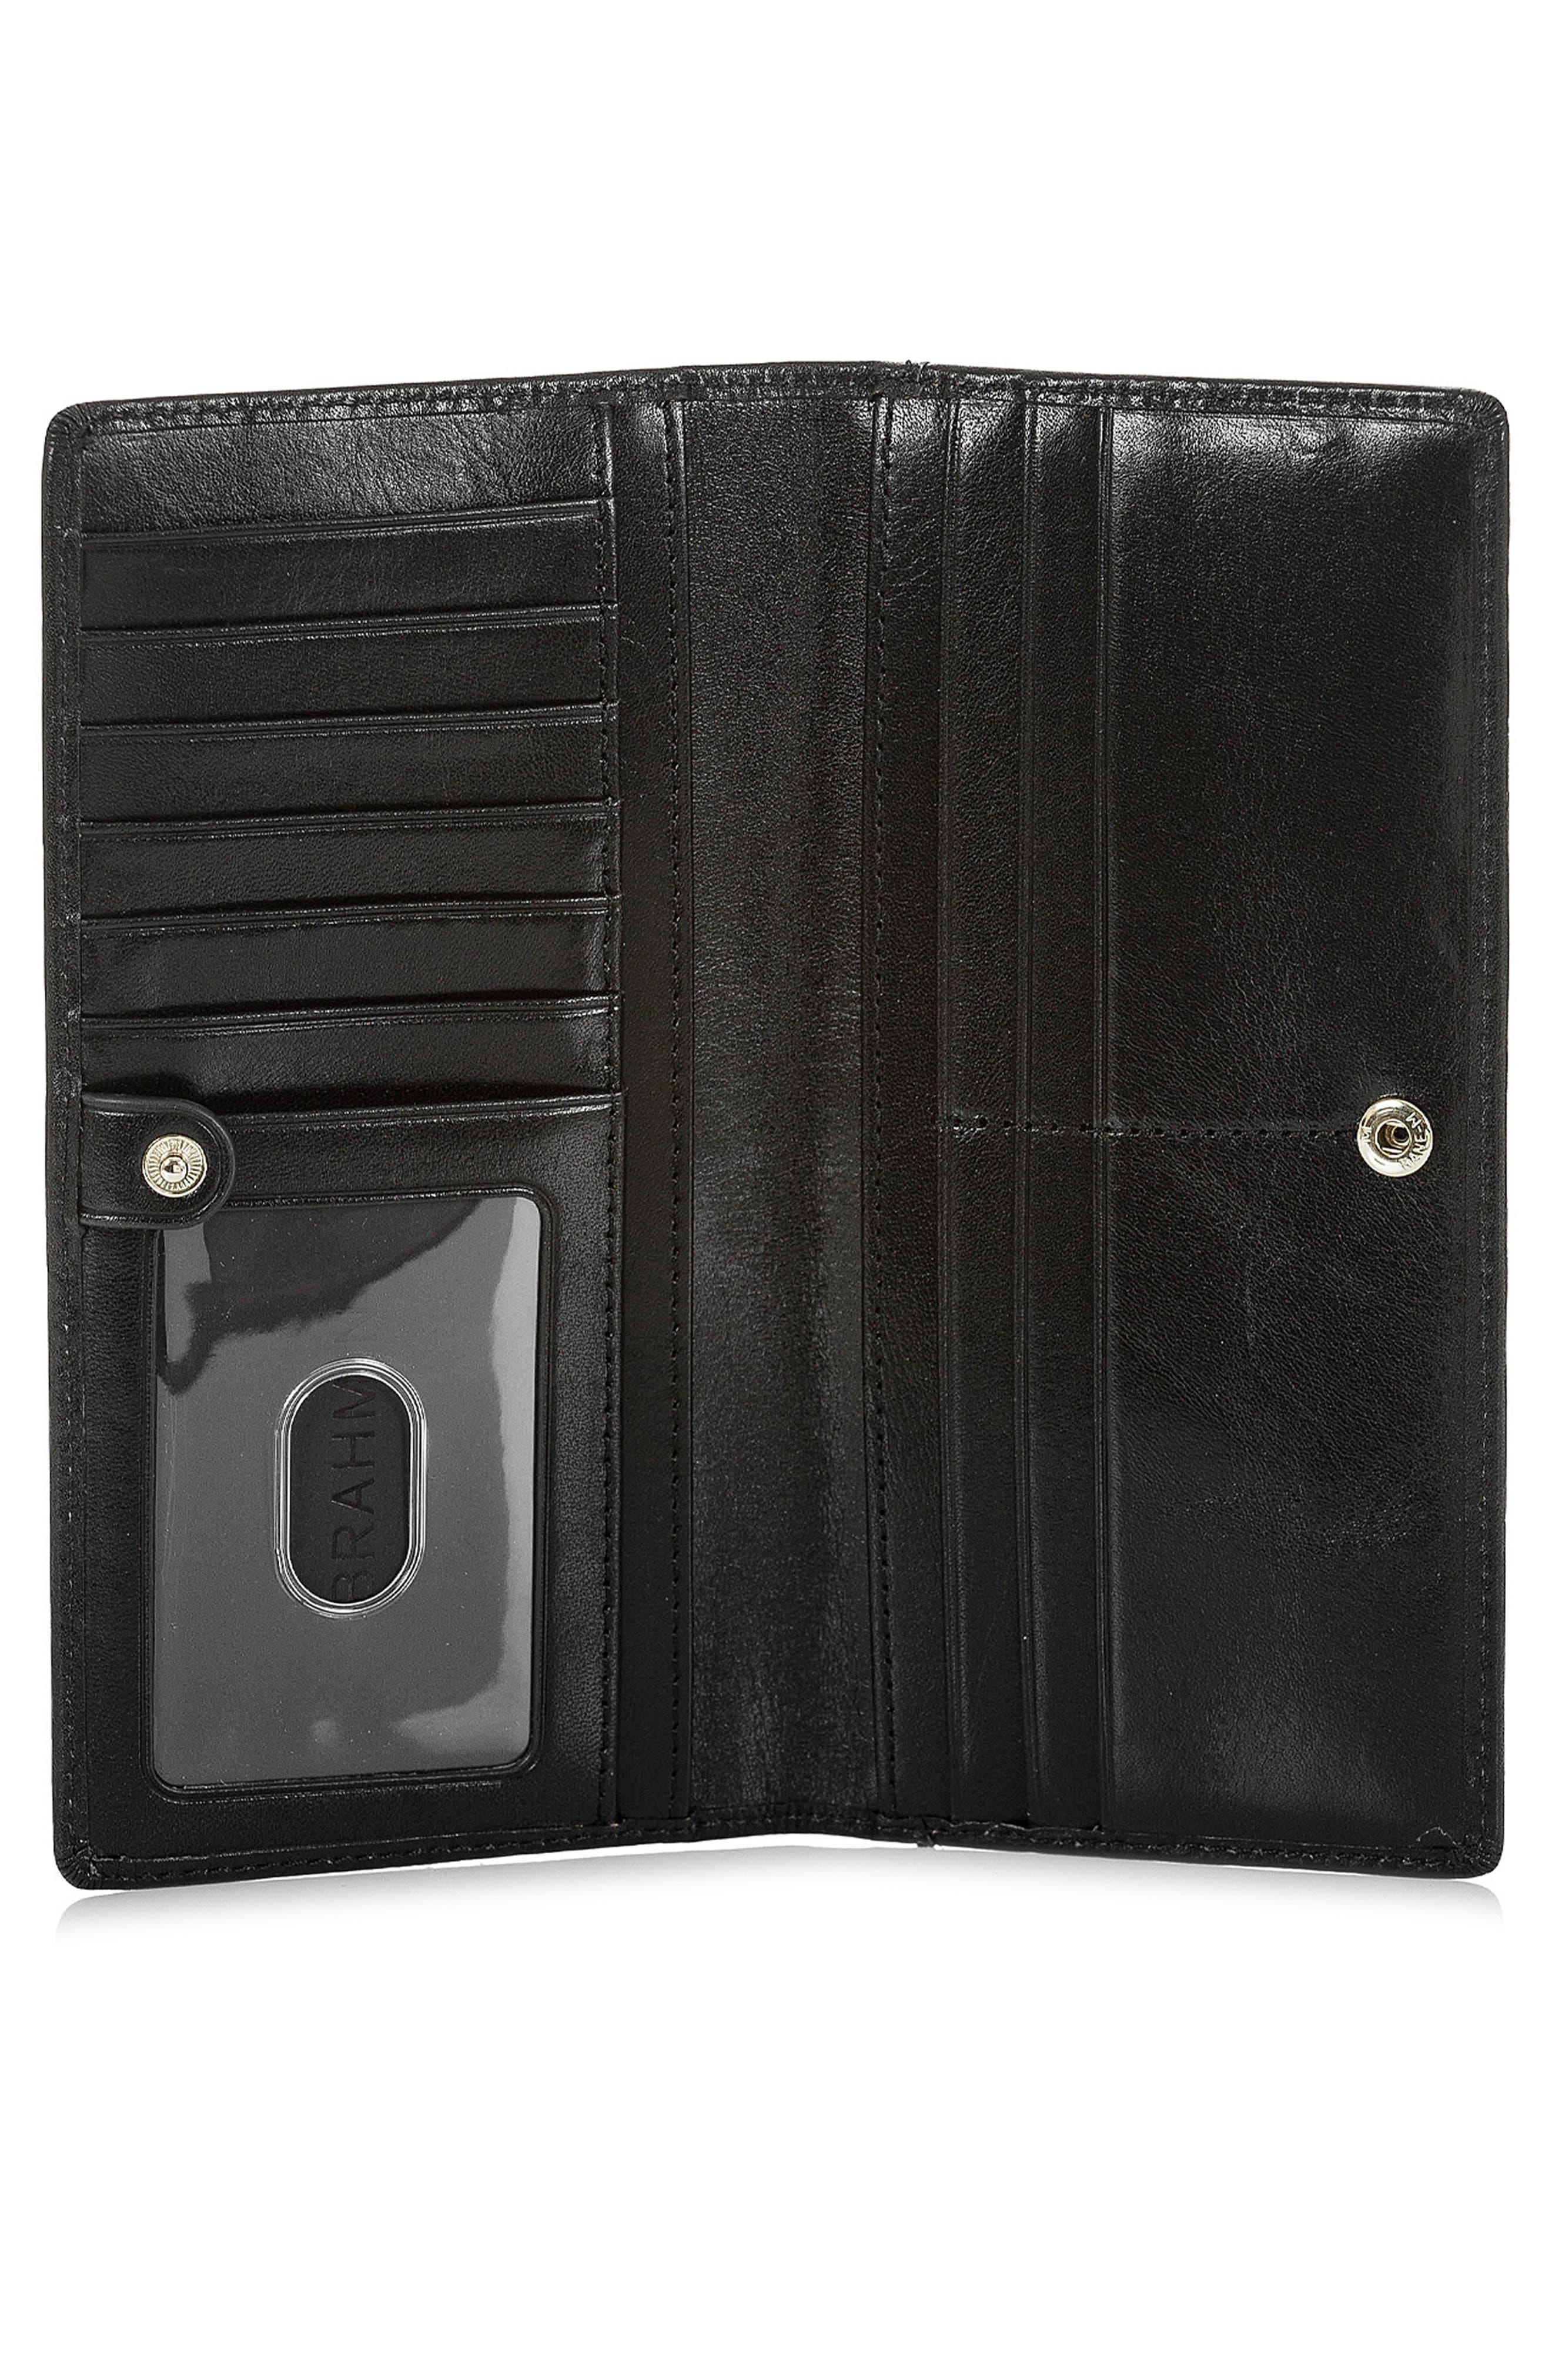 BRAHMIN, Ady Leather Wallet, Alternate thumbnail 2, color, 001